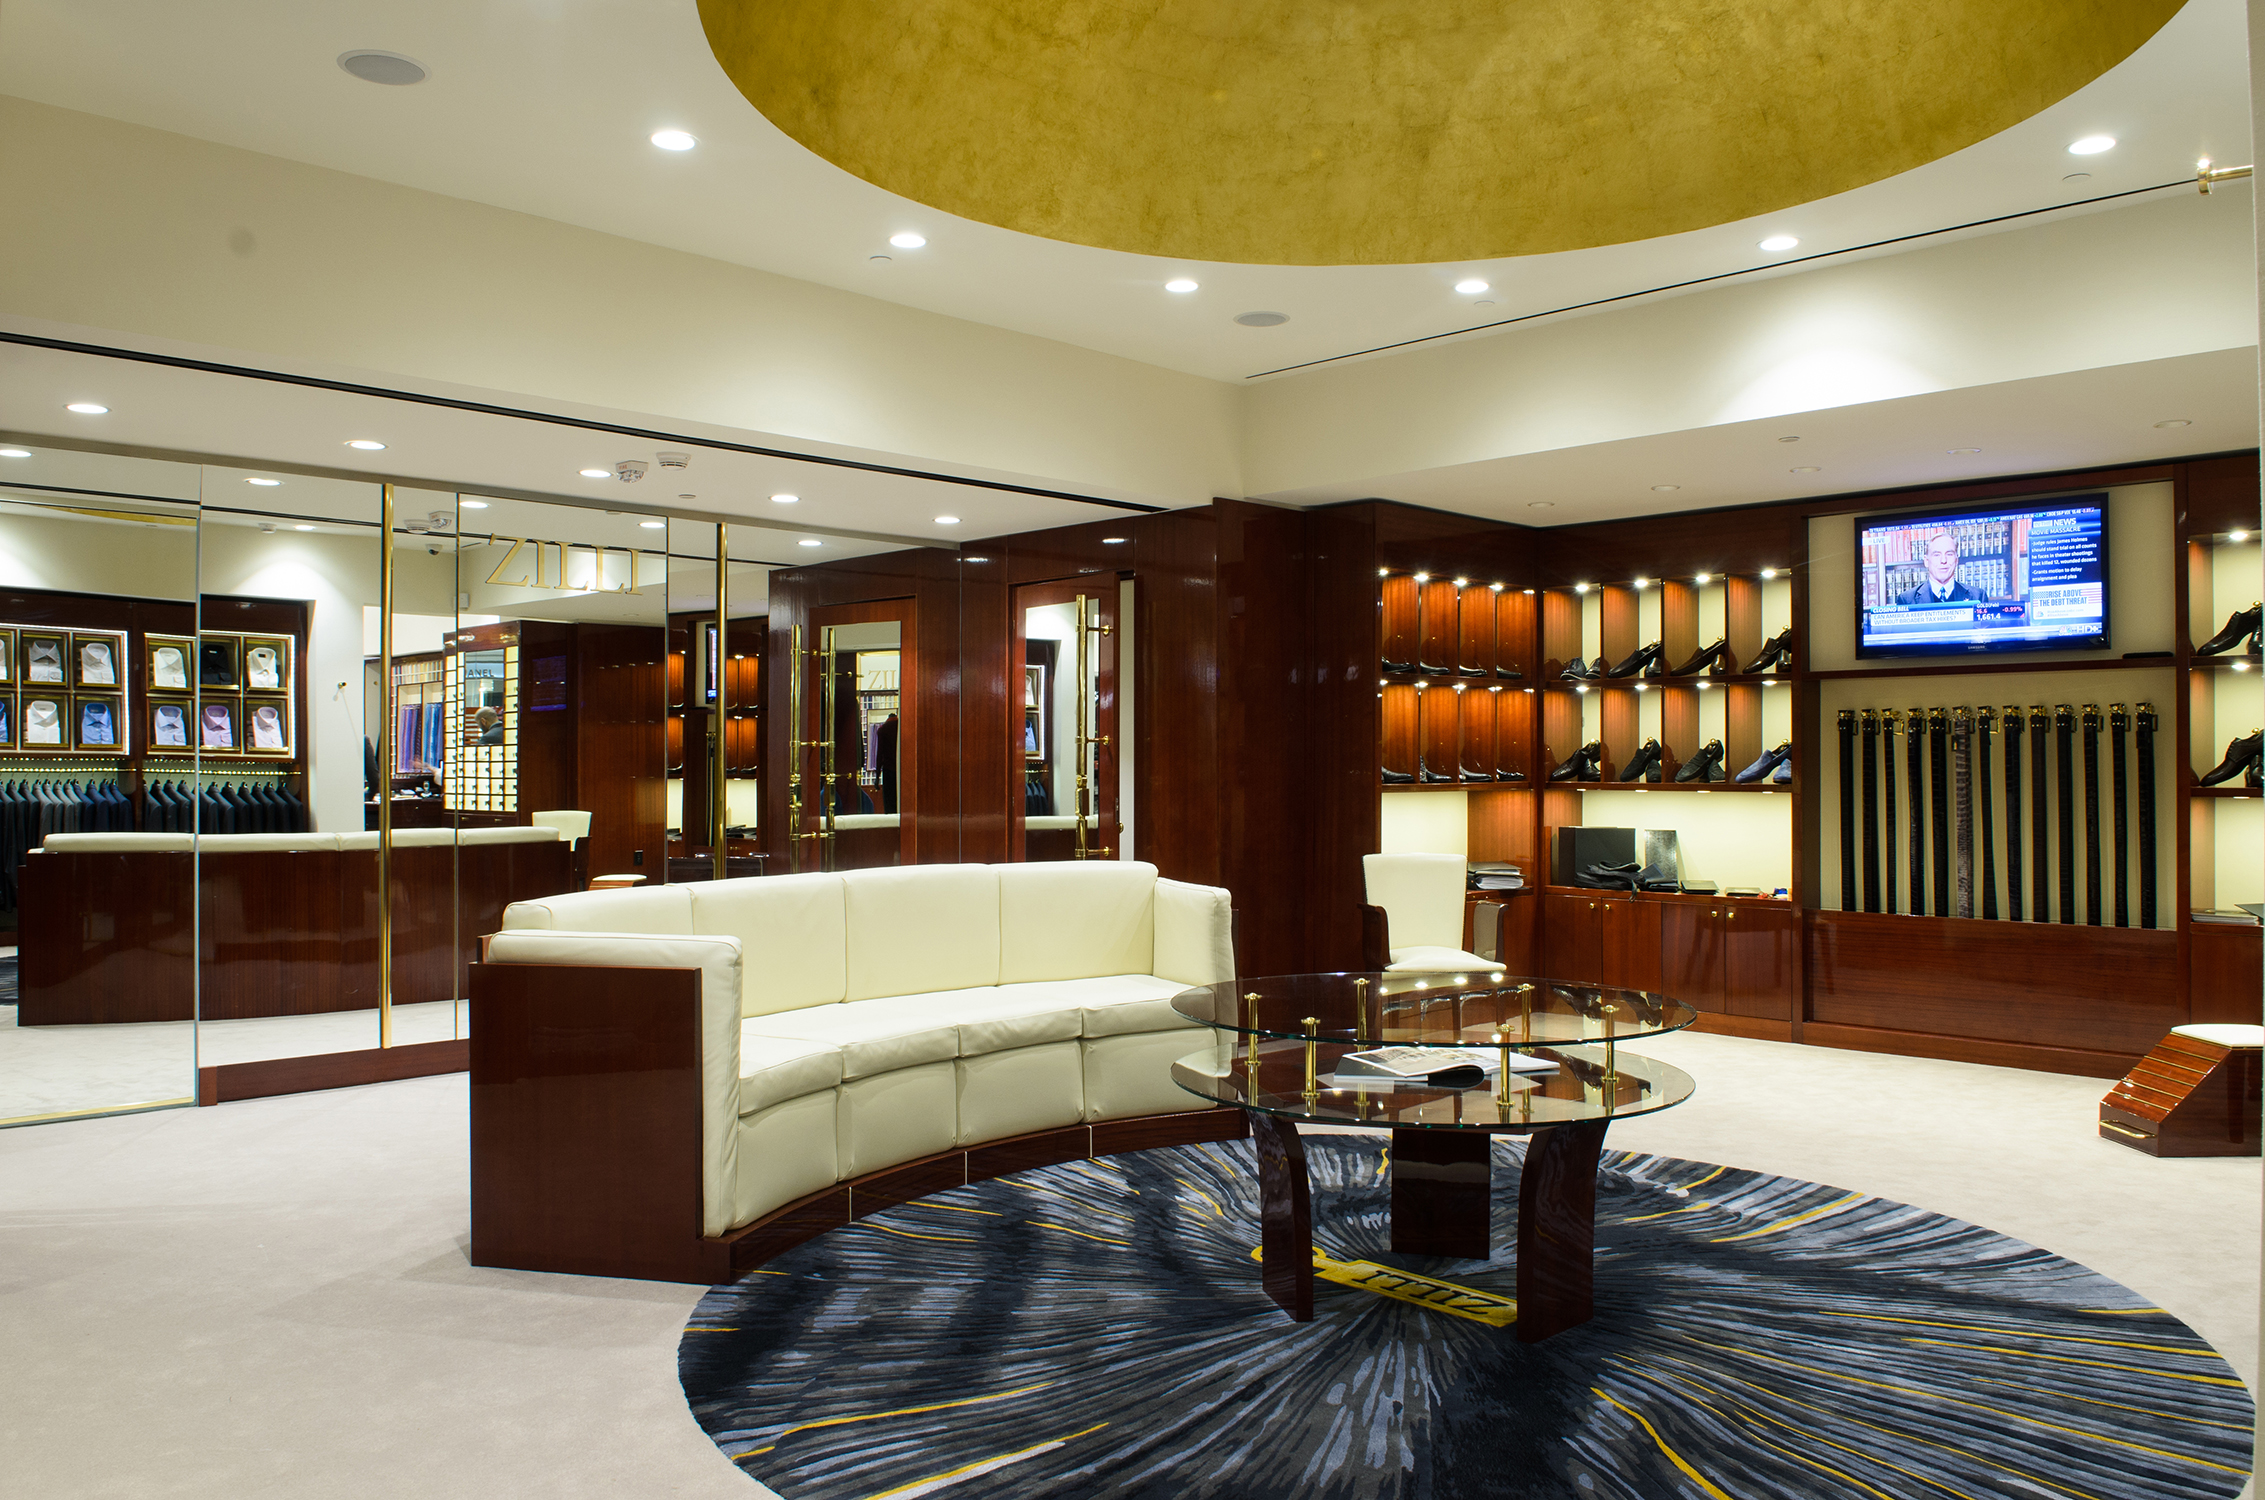 streetsense designs second u s store for luxury men s clothing streetsense designs second u s store for luxury men s clothing atelier zilli